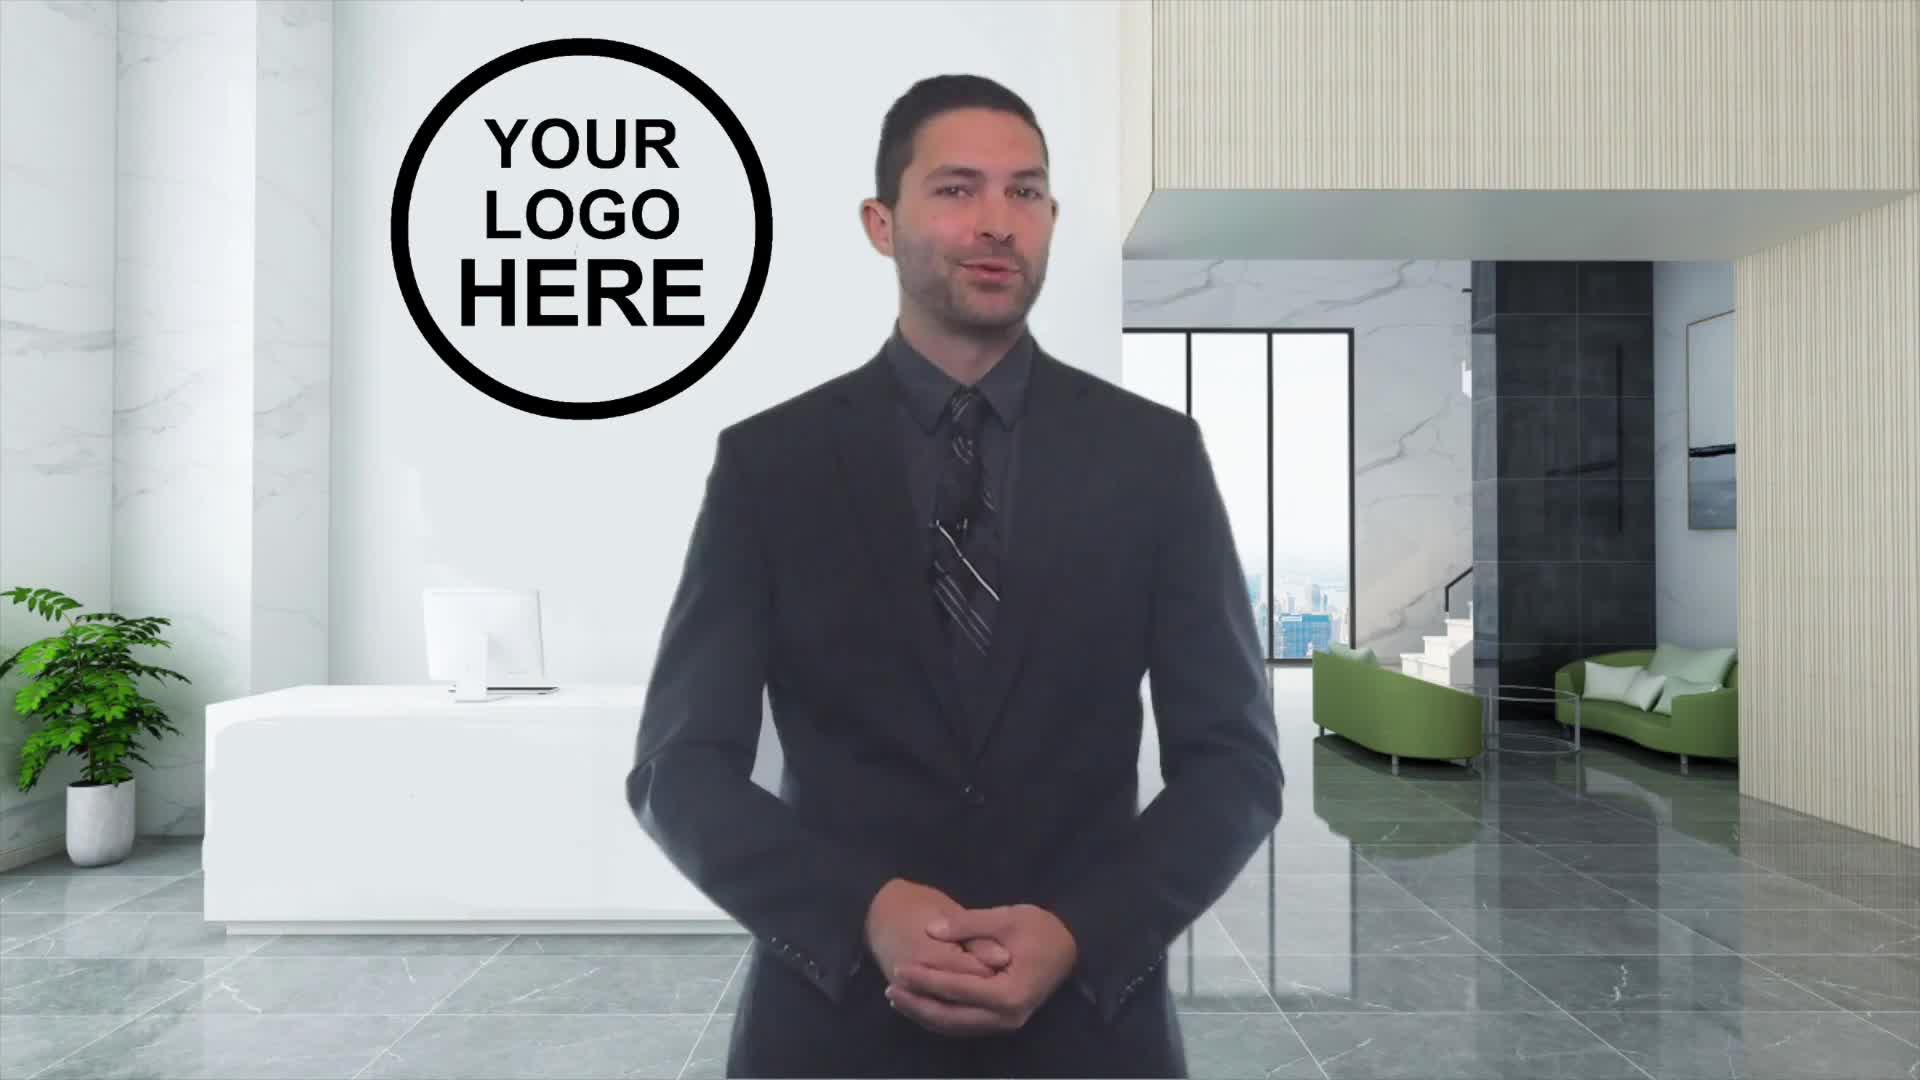 professional-video-animation-freelancer-image-238726